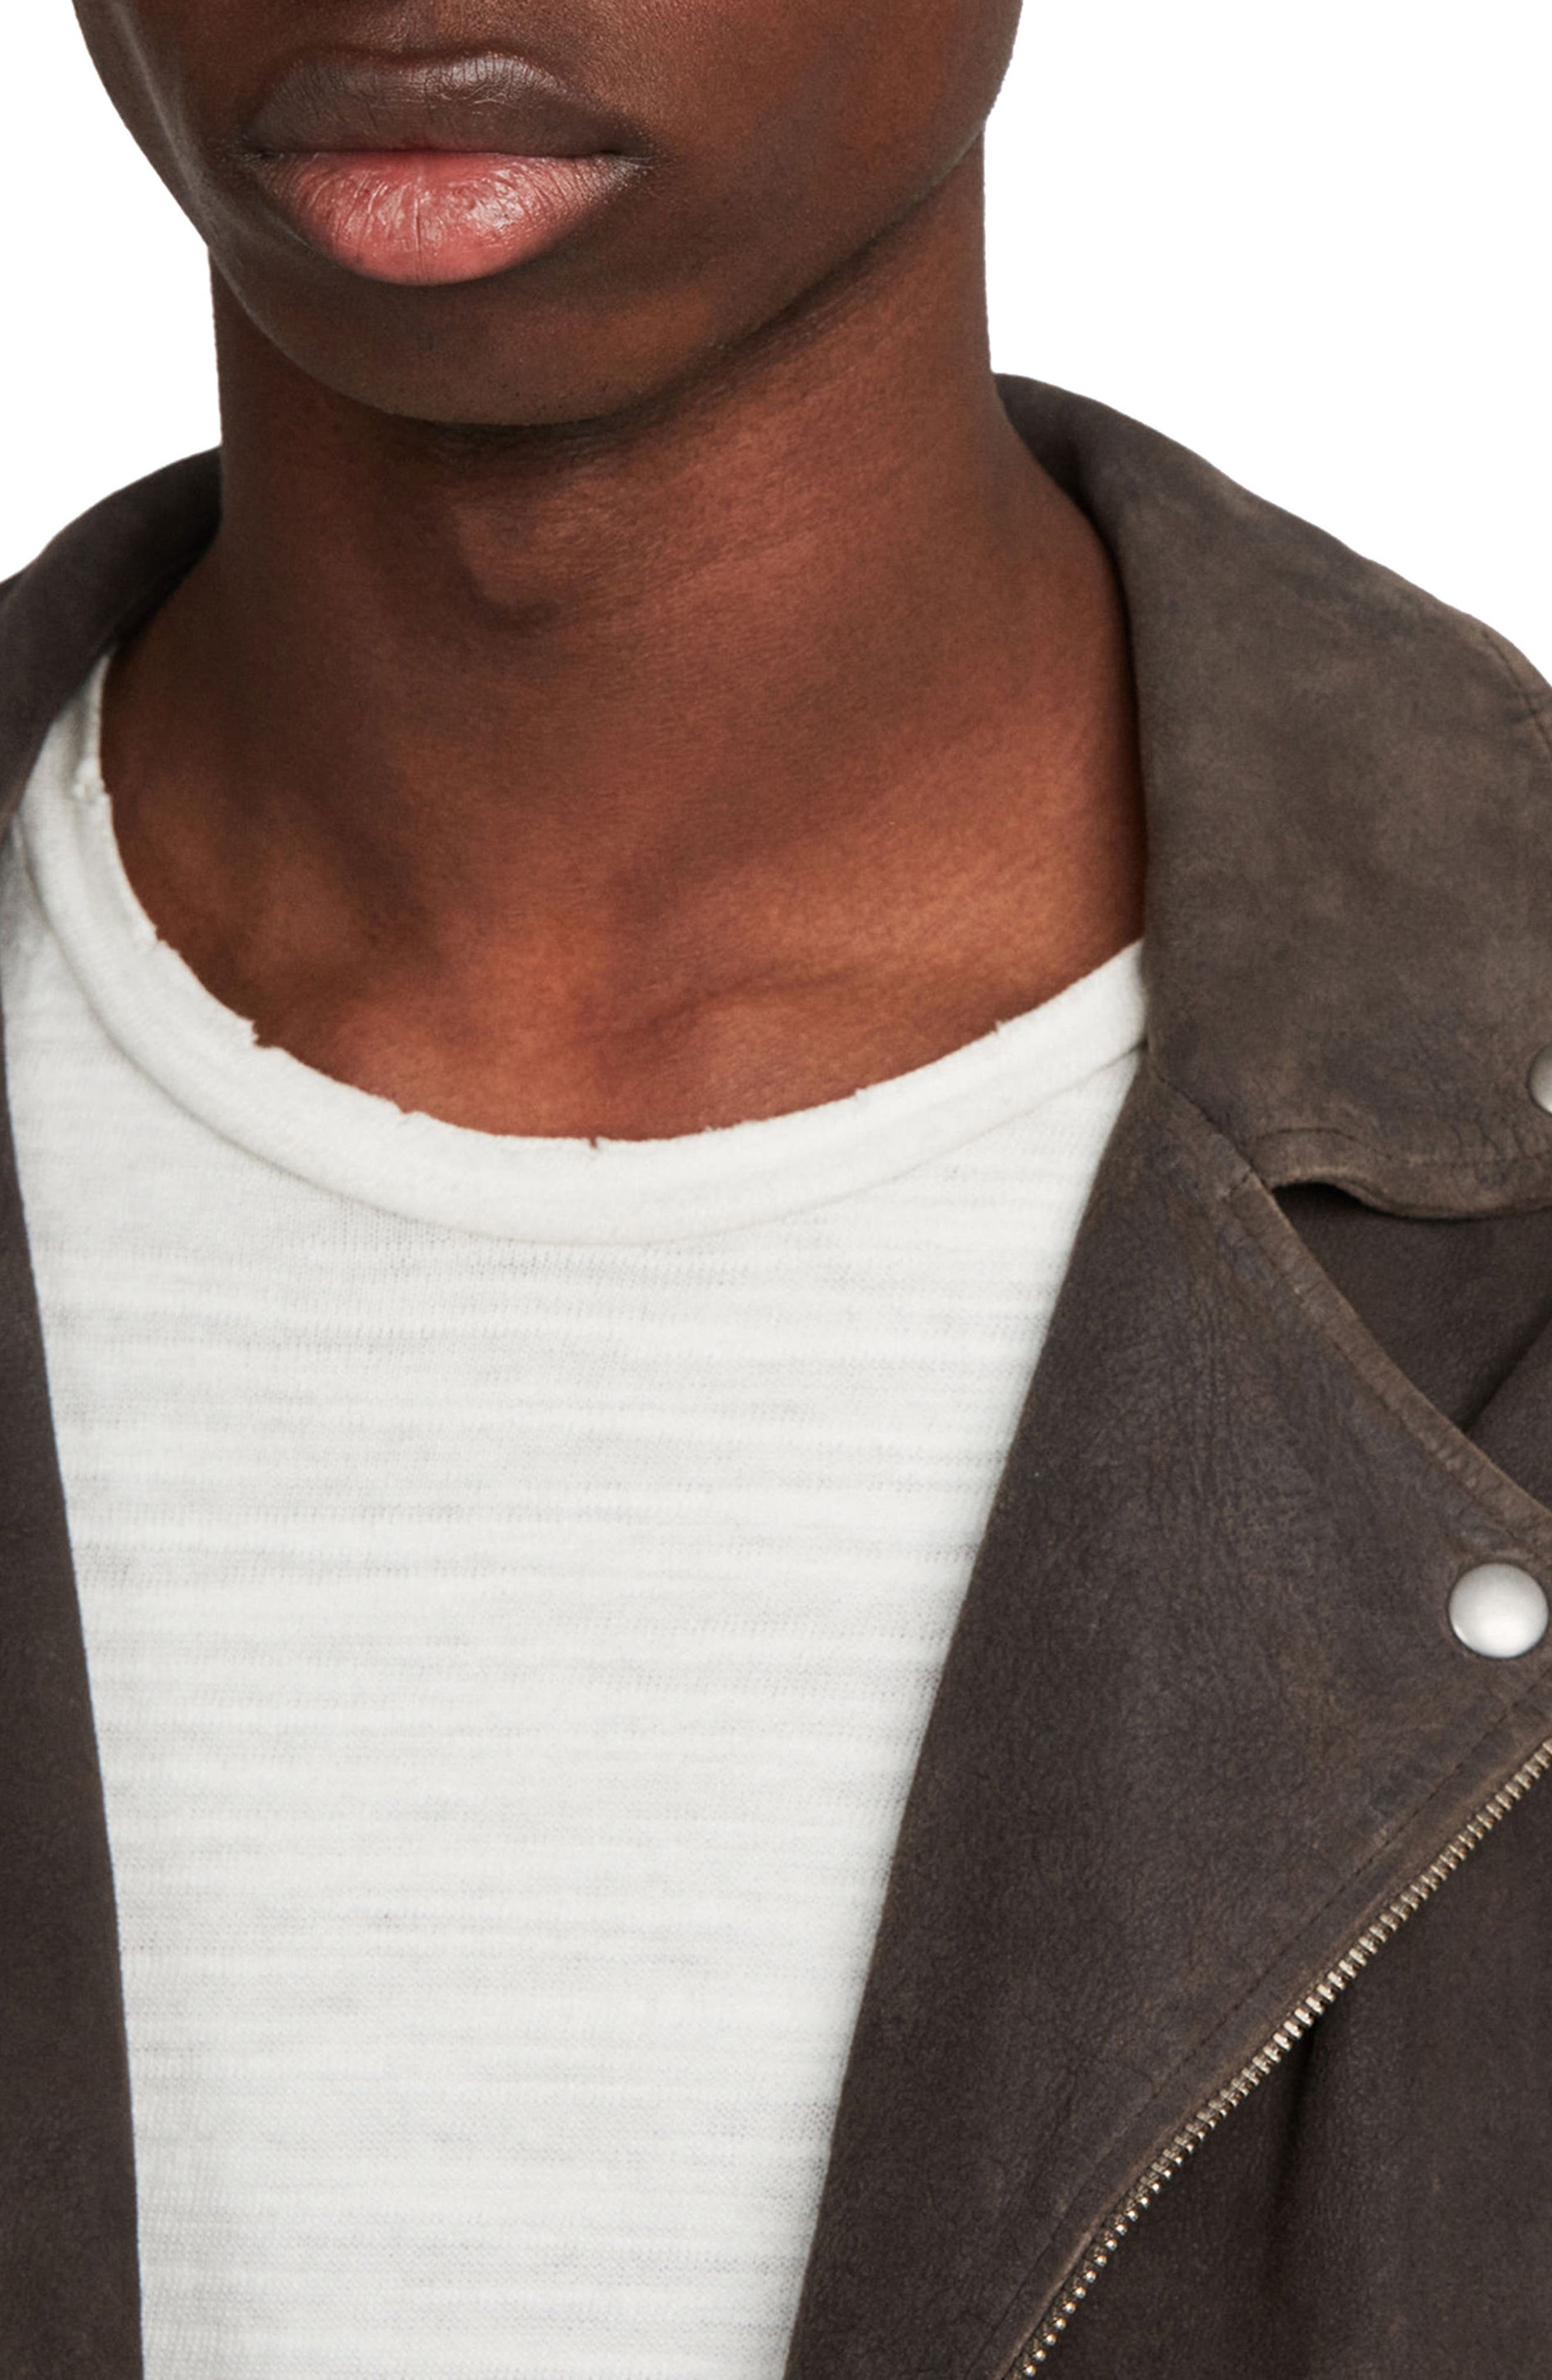 Kano Suede Moto Jacket,                             Alternate thumbnail 6, color,                             Gravel